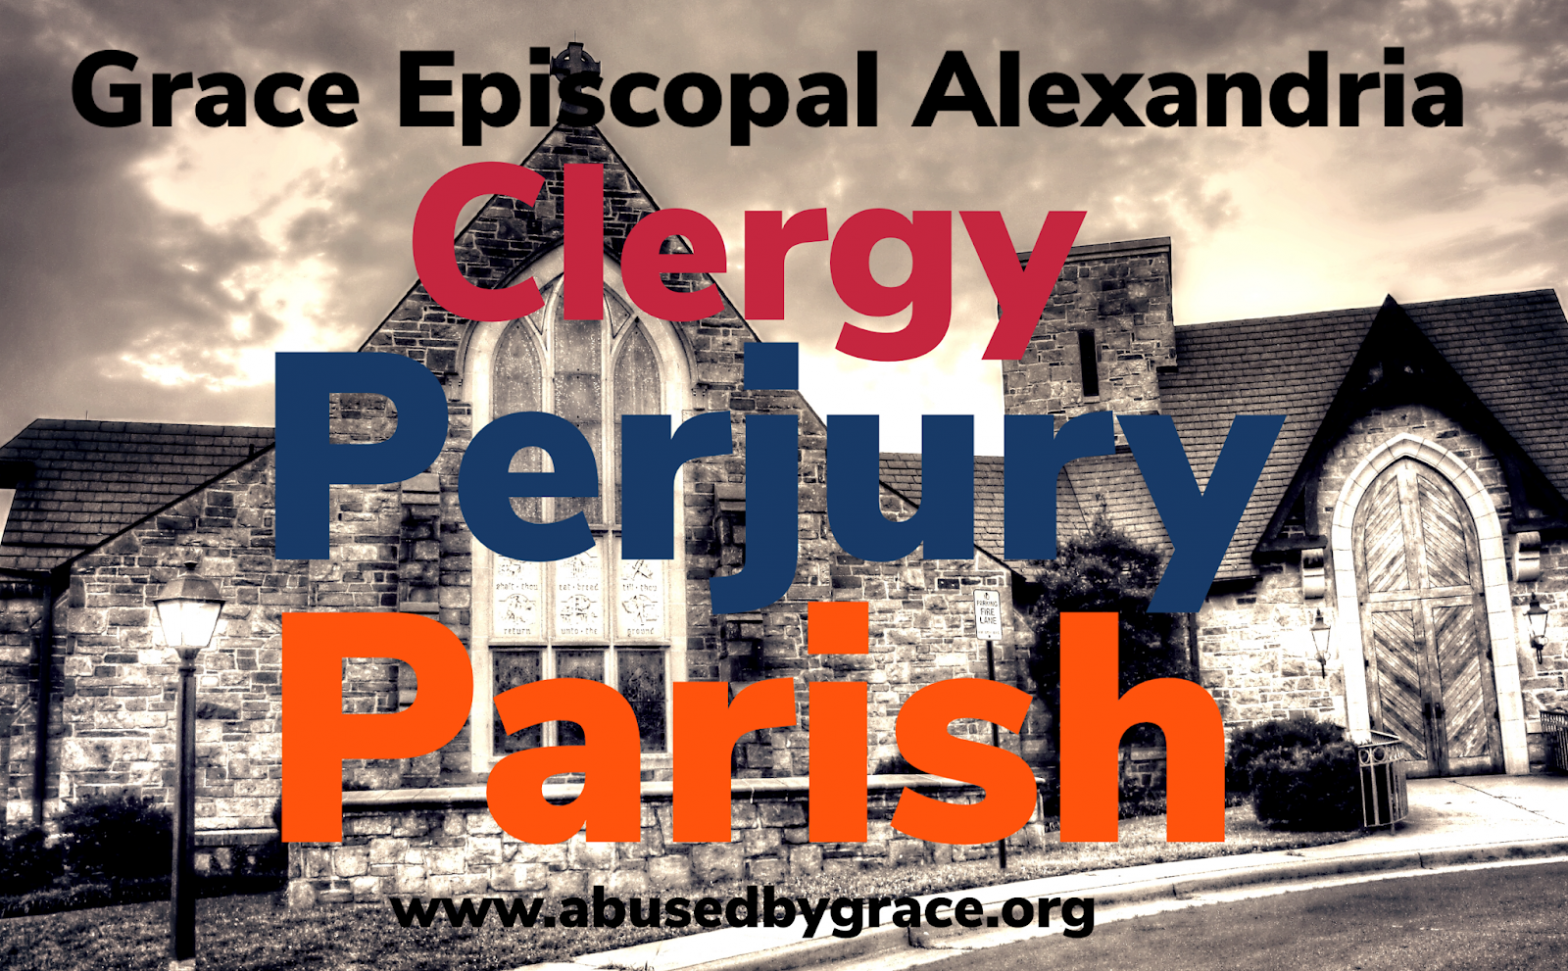 Grace Episcopal the clergy perjury parish